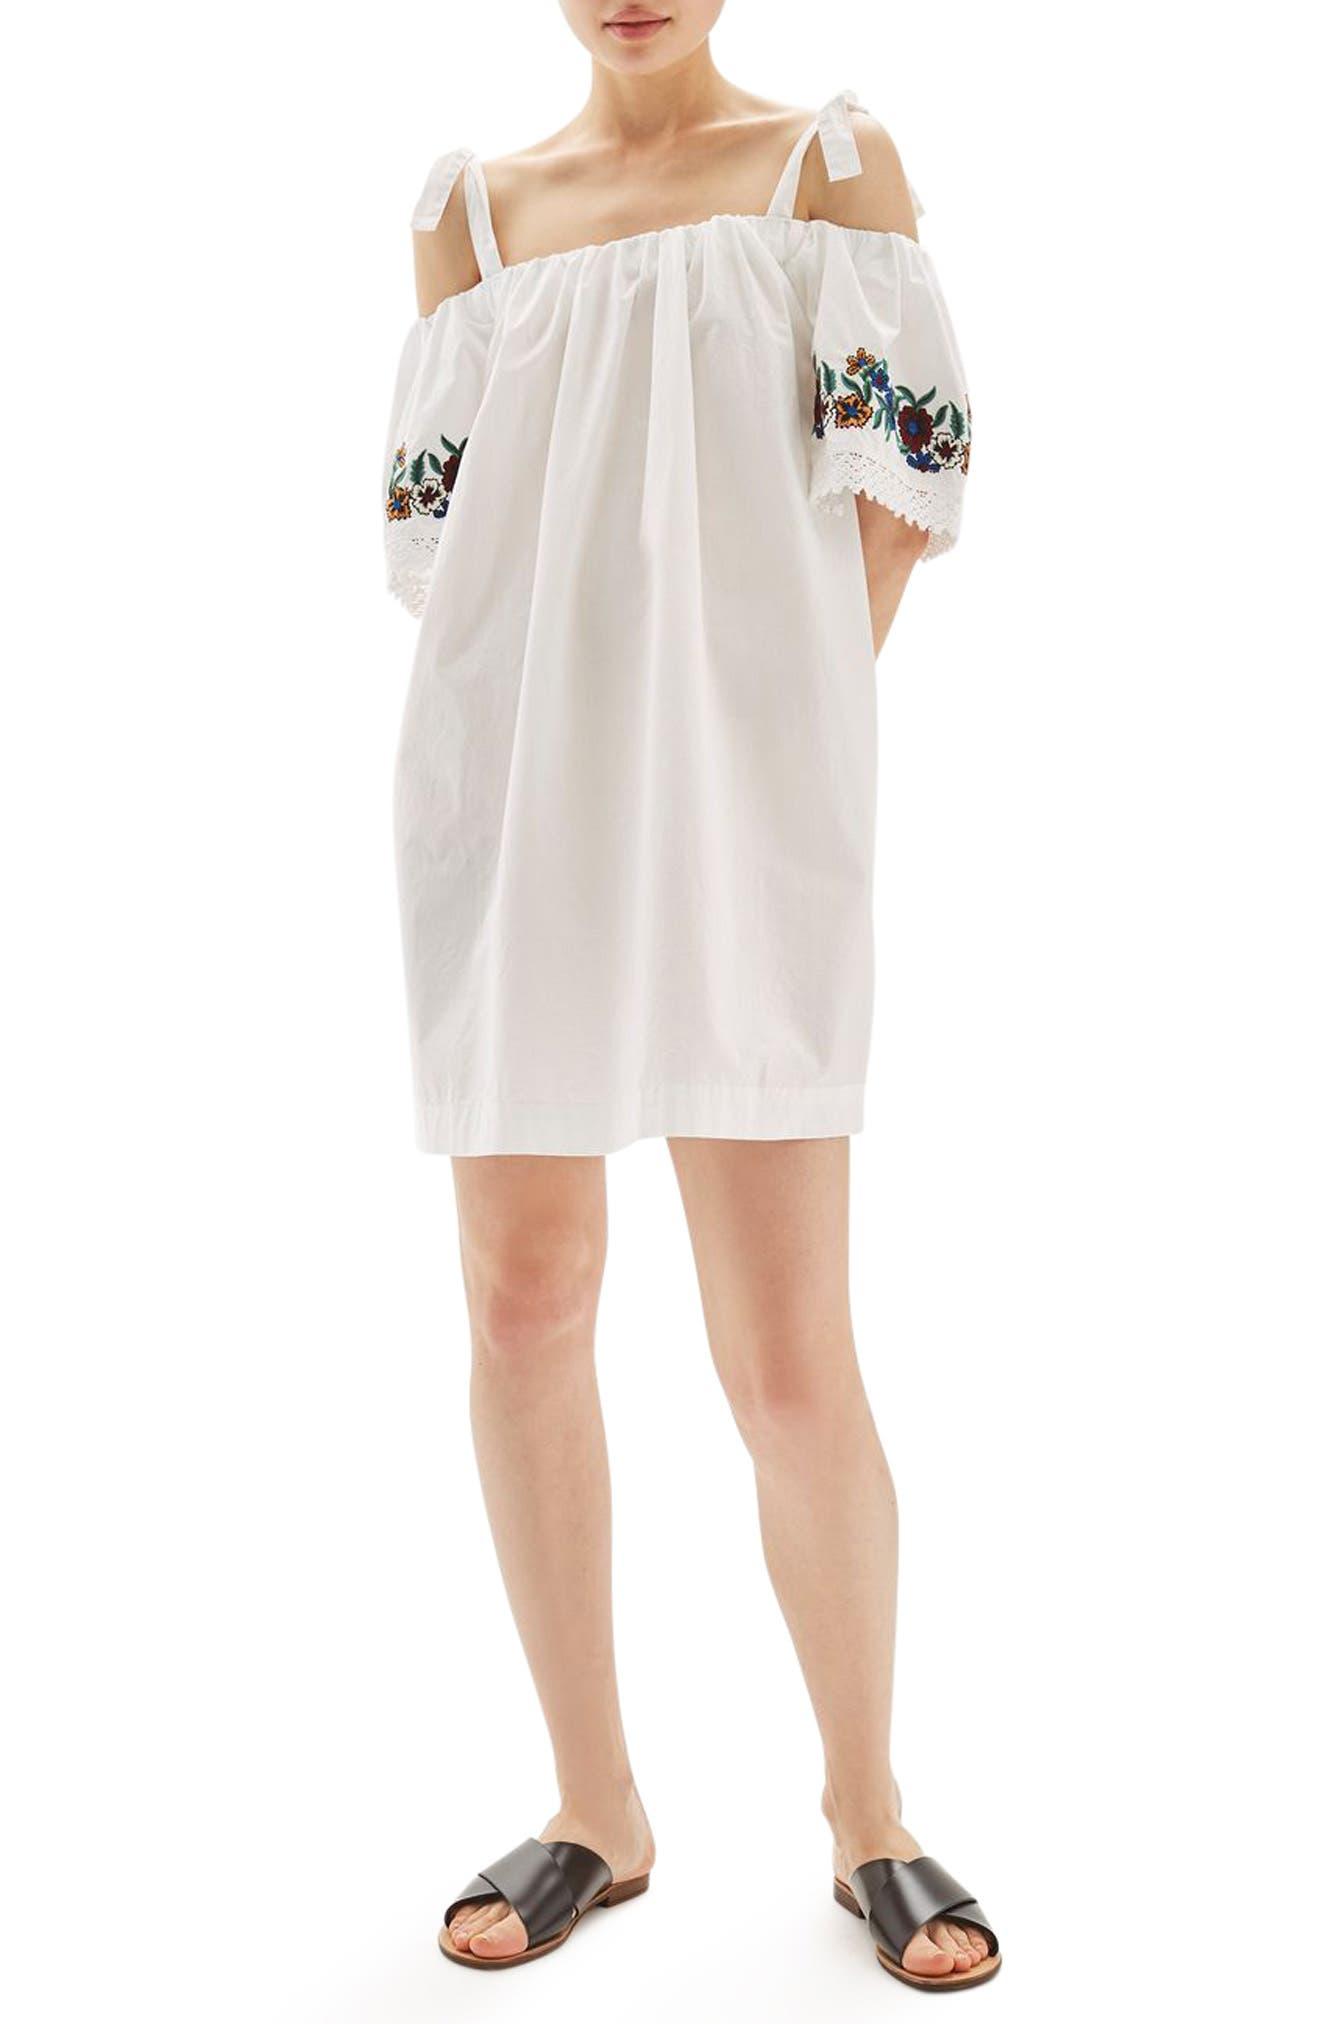 Topshop Bardot Embroidered Dress